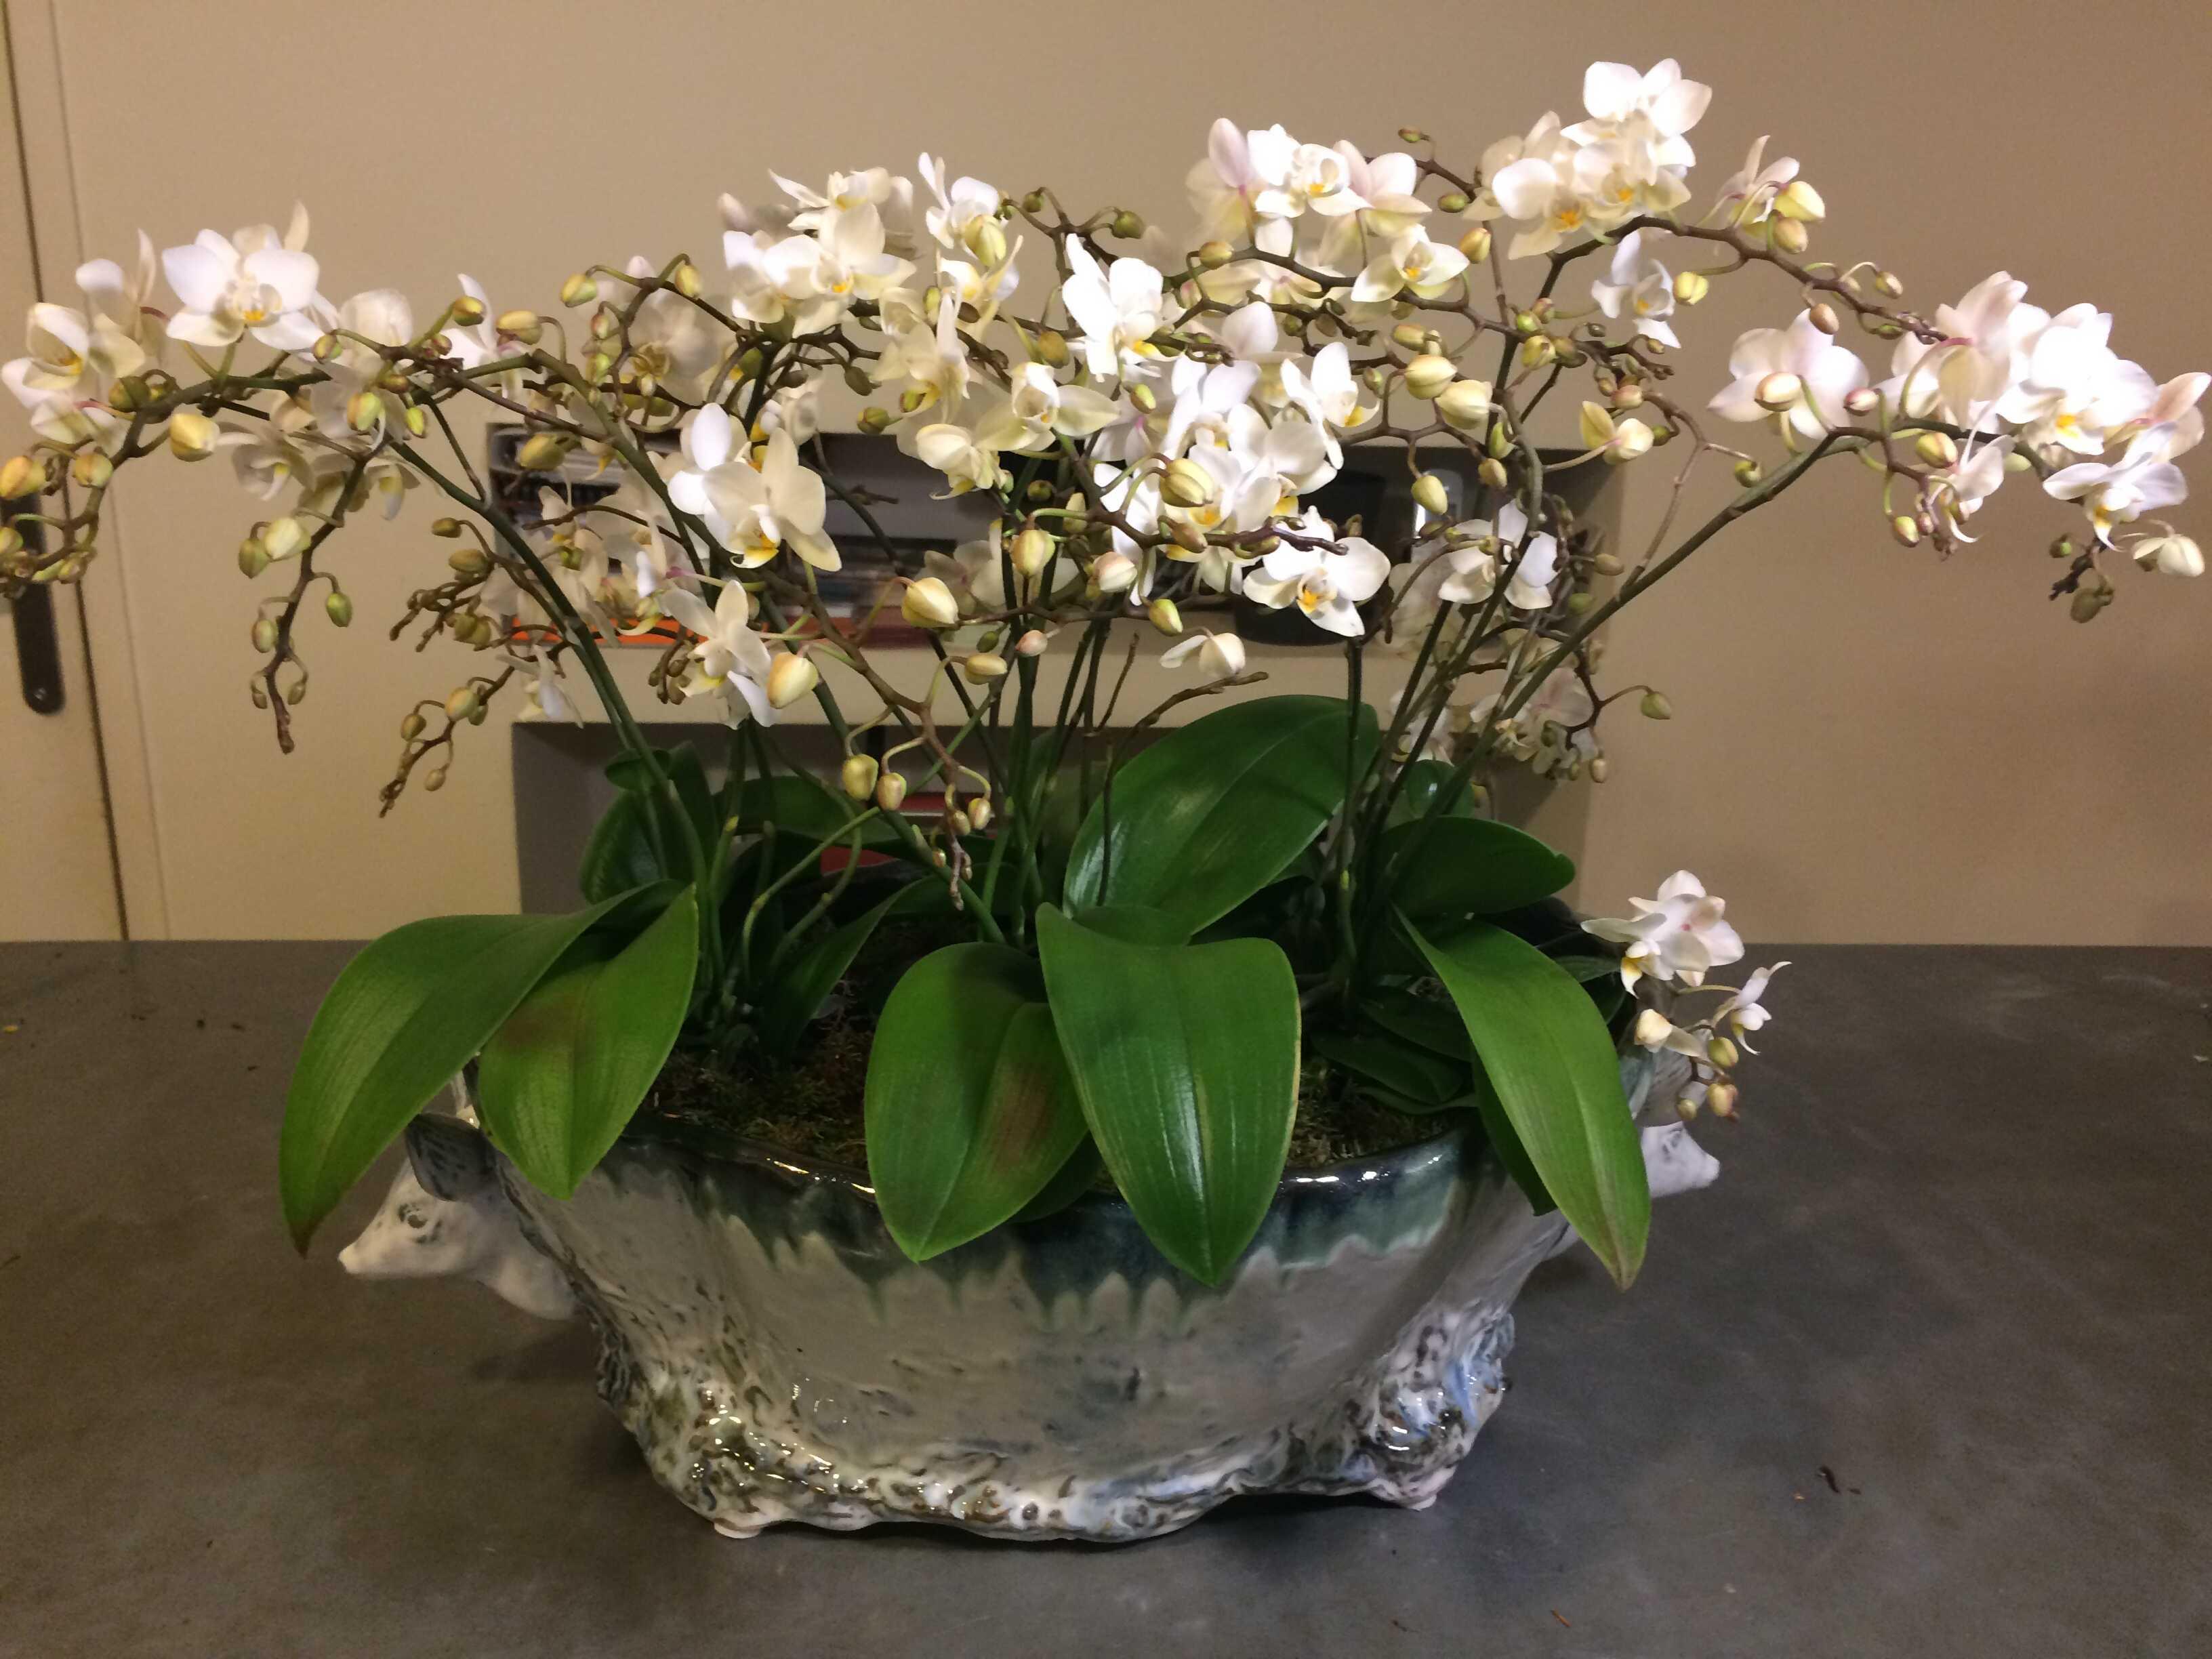 Plante orchidée phalaenopsis Marlies Fleurs fleuriste Nimes